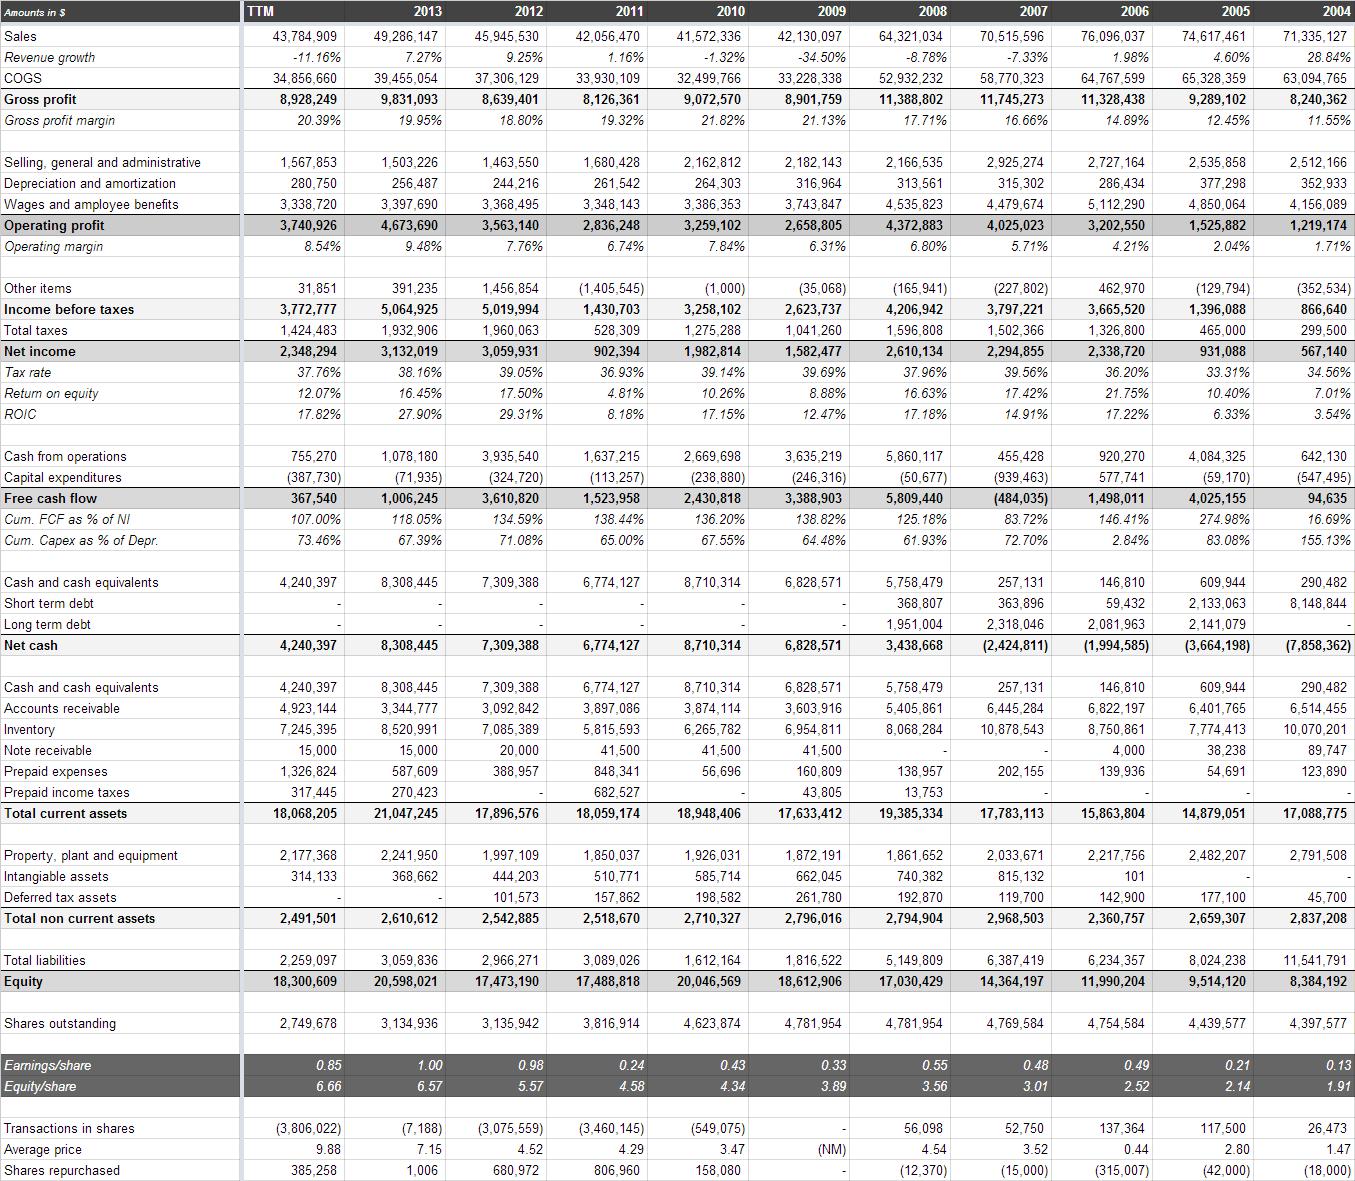 Historical financials Jewett-Cameron